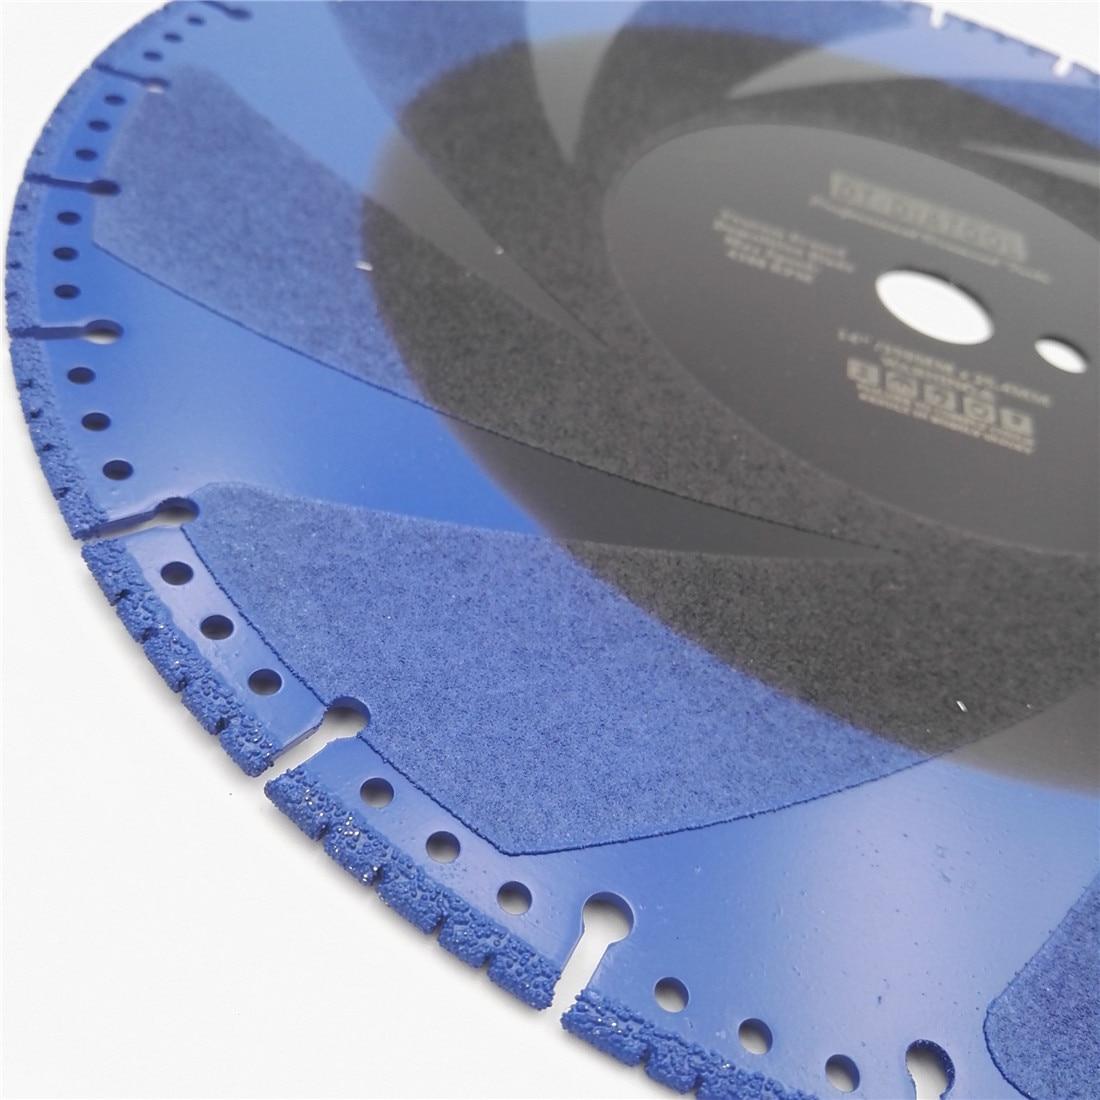 SHDIATOOL 2pcs Dia 14 Diamond Silent Saw Blade Sandwich Steel Core Cutting Disc Bore 60mm 50mm Granite Blade Diamond Wheel - 5